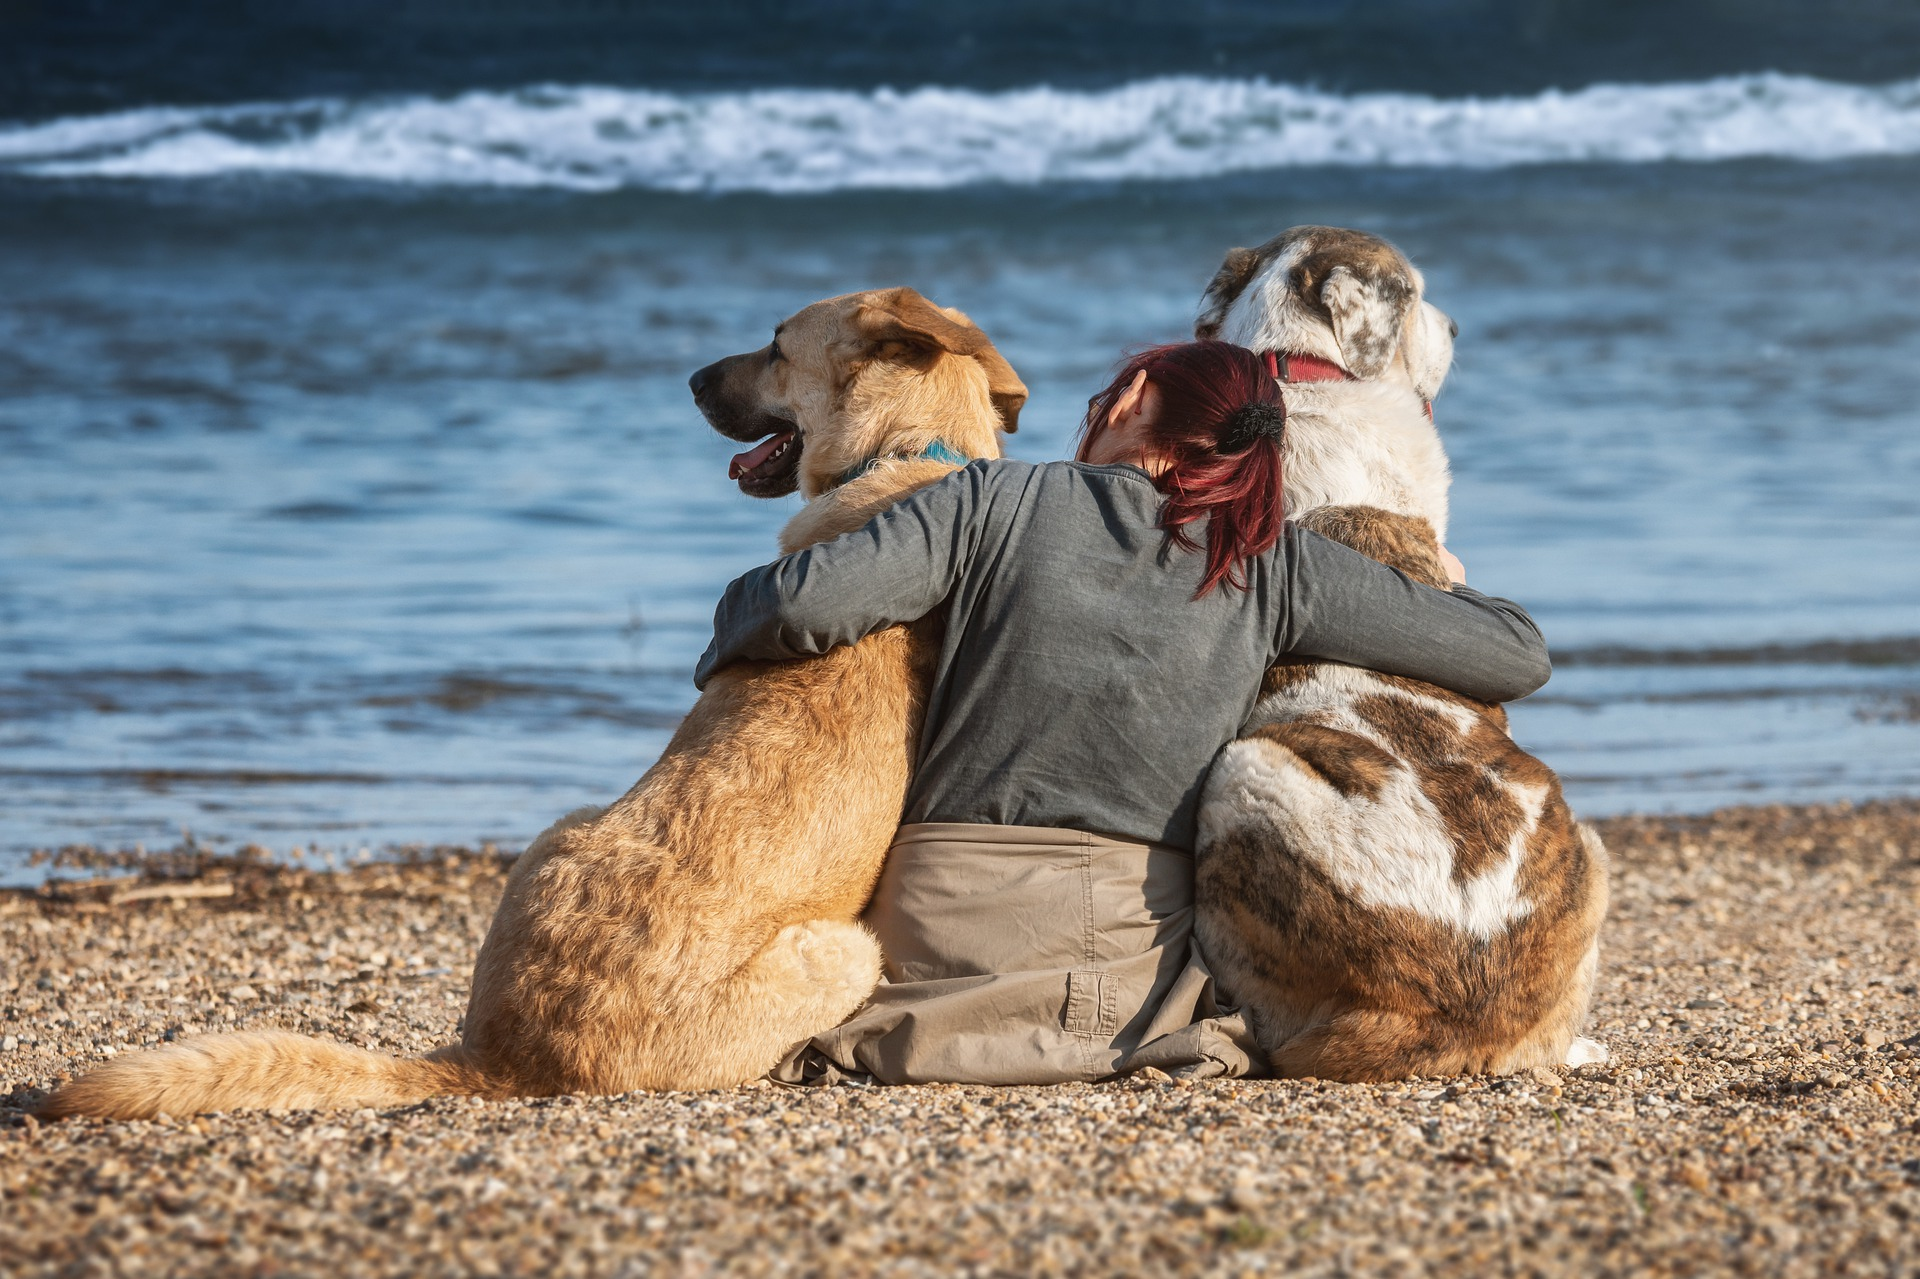 dogs-4220163_1920.jpg?1566296204